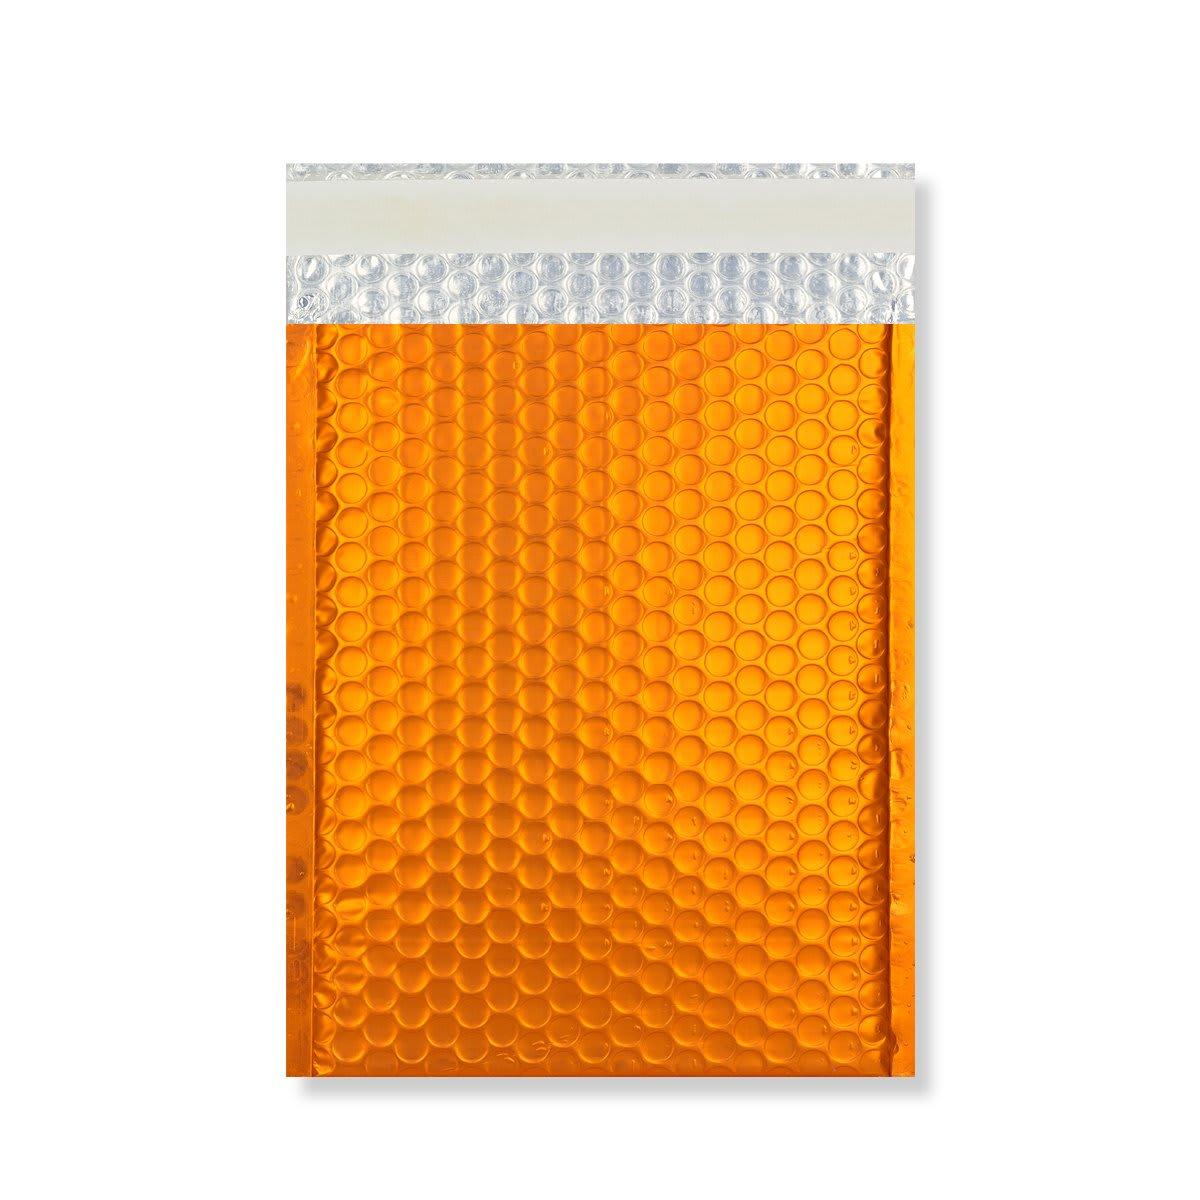 C4 MATT METALLIC ORANGE PADDED ENVELOPES (324 x 230MM)